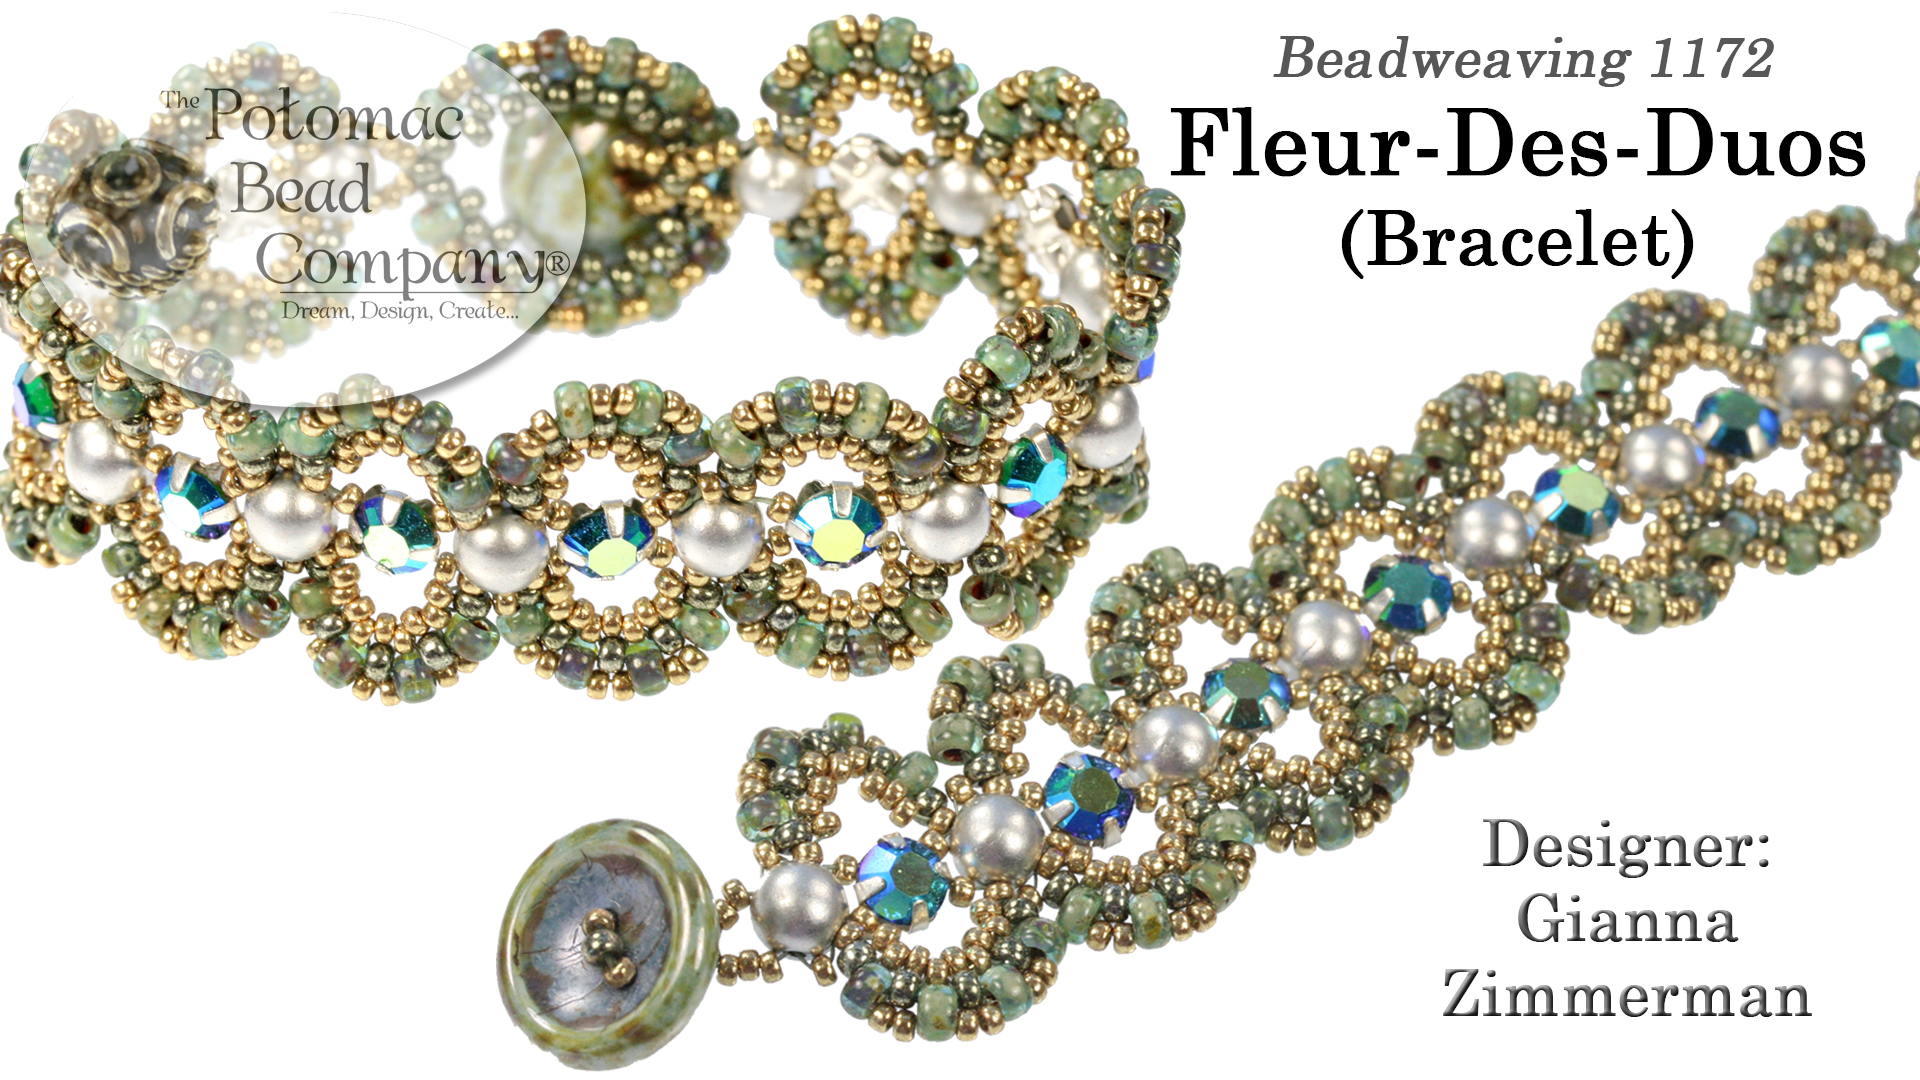 How to Bead / Videos Sorted by Beads / RounDuo® & RounDuo® Mini Bead Videos / Fleur Des Duos Bracelet Tutorial